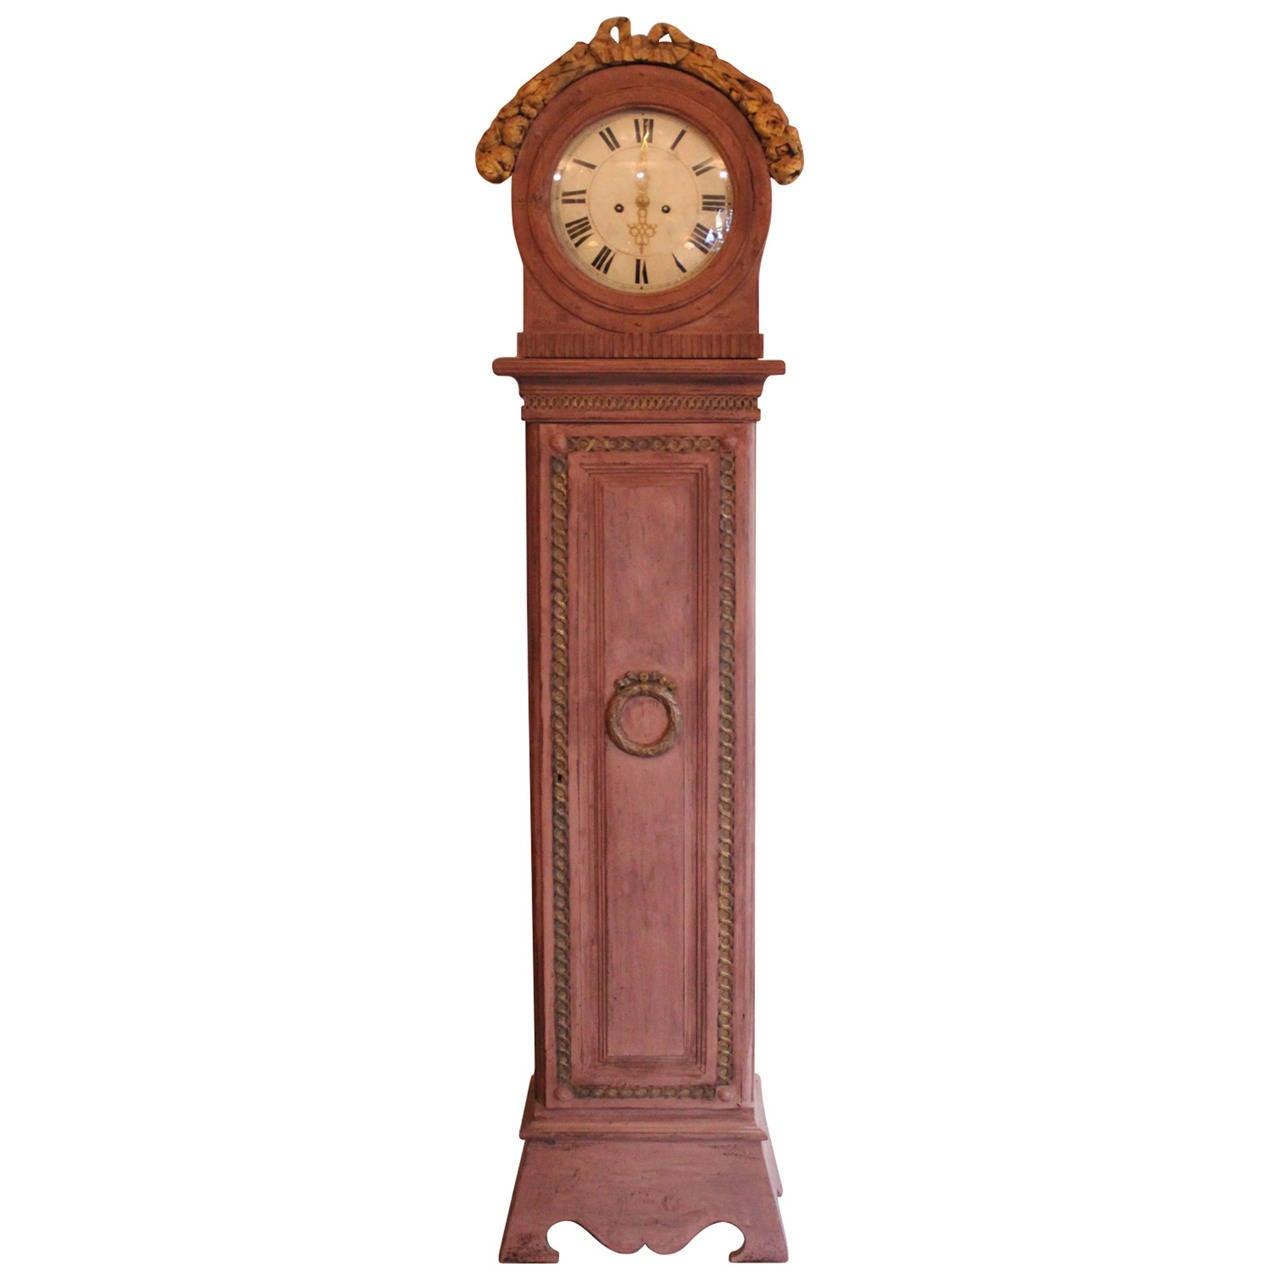 Antique, gustavian painted, danish Longcase Clock, 18th century